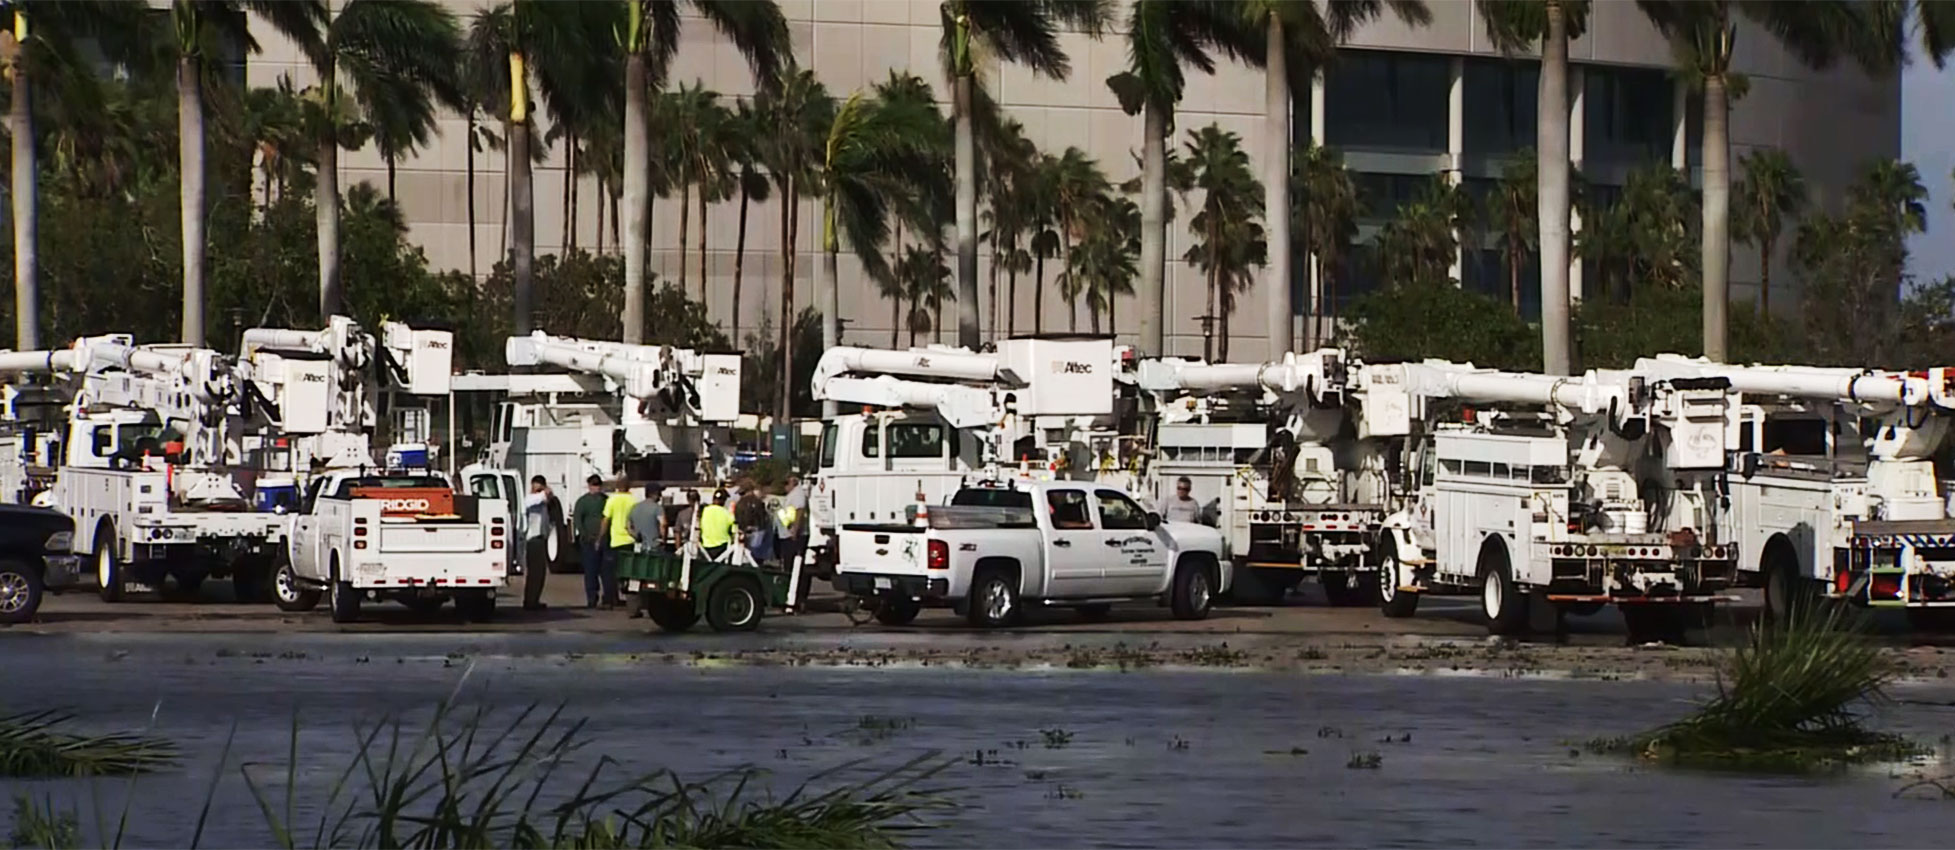 power trucks Irma response Florida